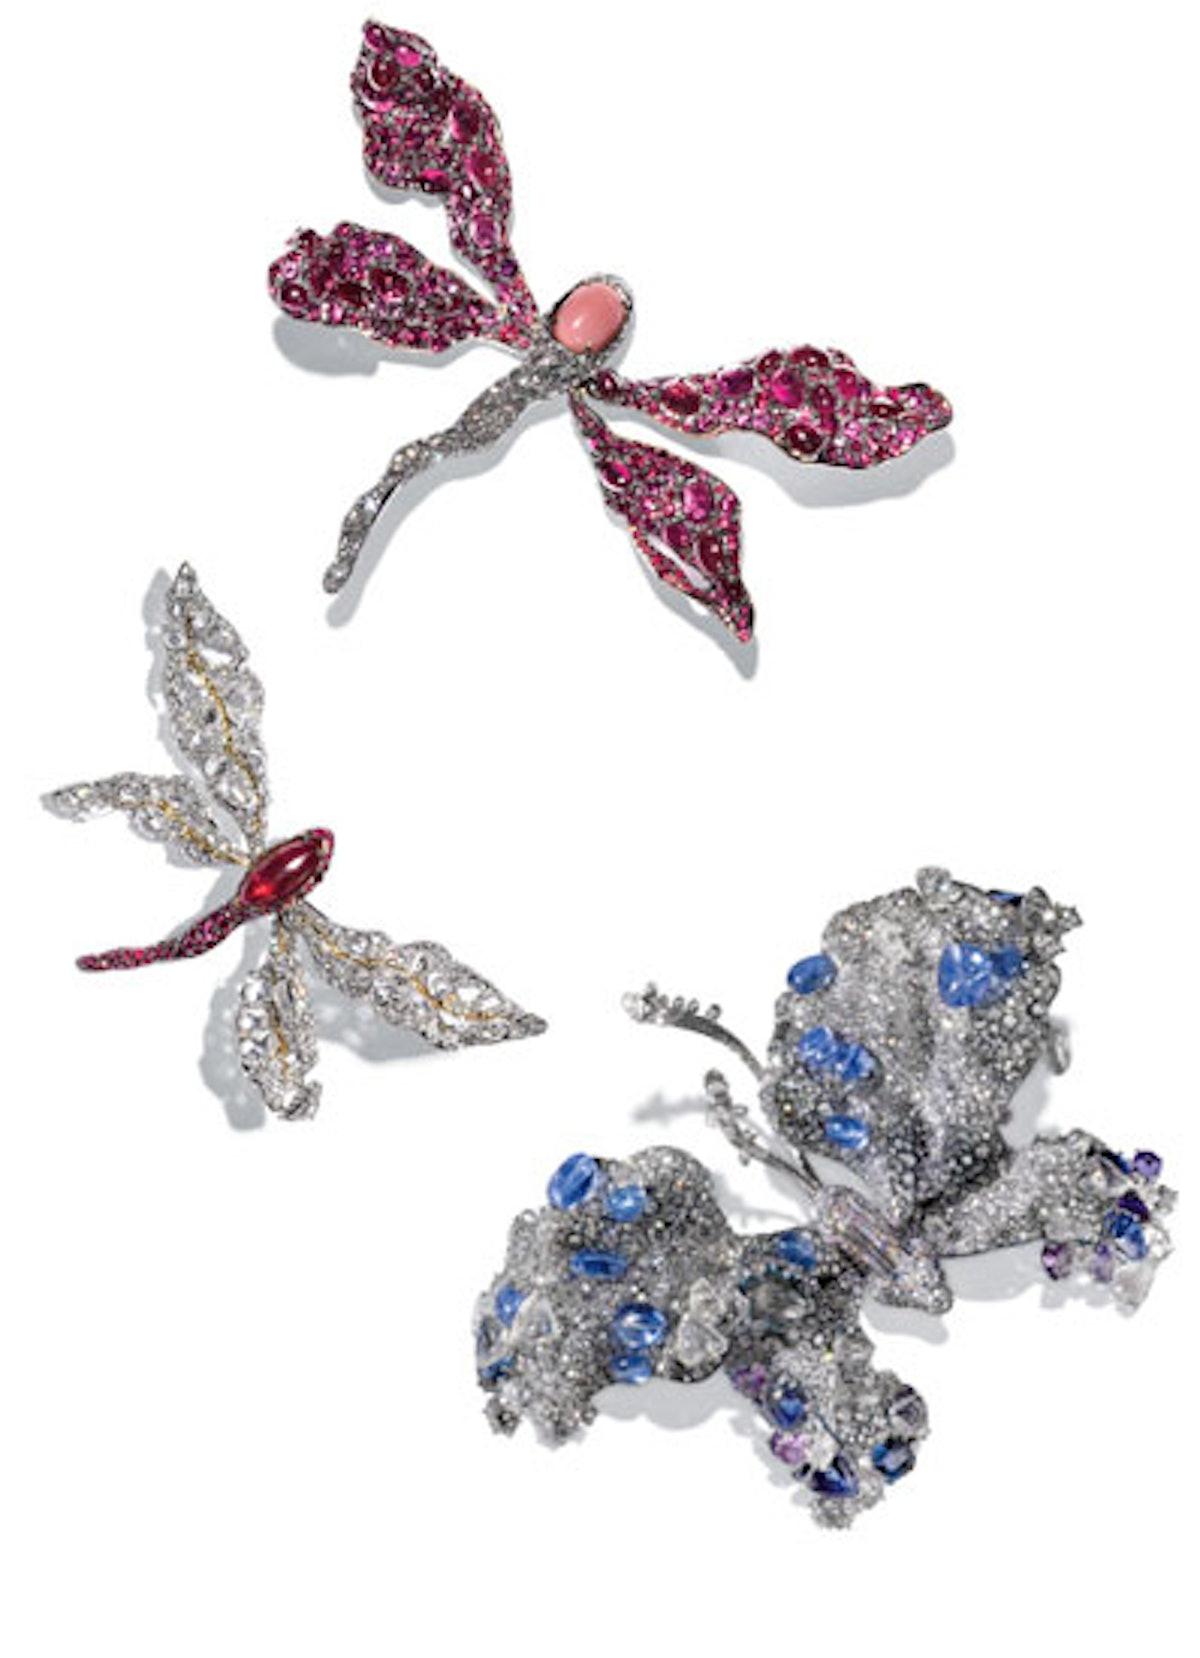 acss-claudia-jewelry-nov-2012-04-v.jpg